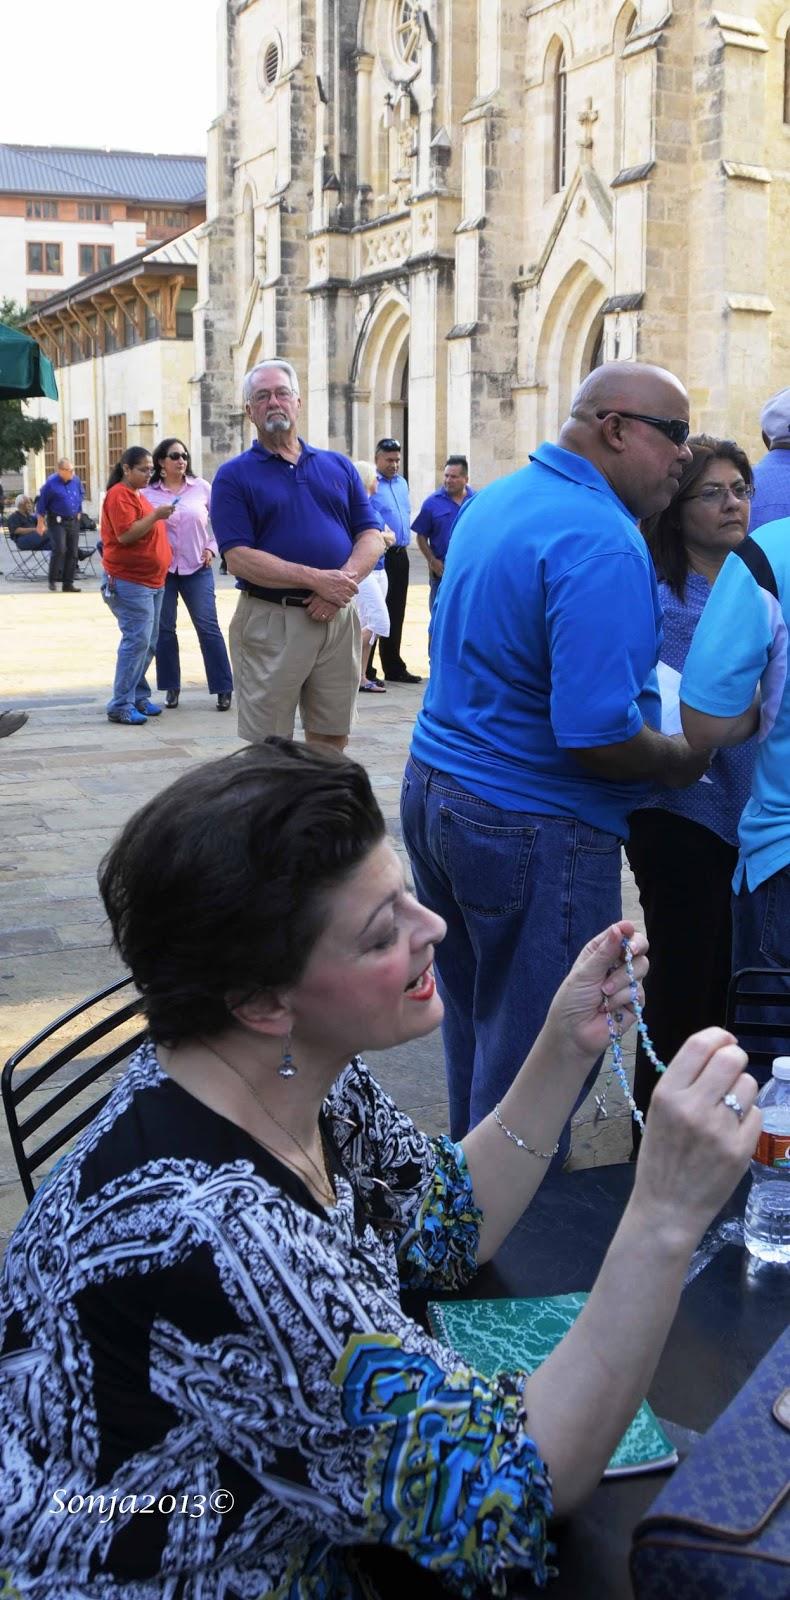 catholic singles in bexar county St luke catholic school in san antonio, texas (tx) serves 518 students in  grades  home  texas  bexar county  $120,000 3 bed   2 bath single  family.